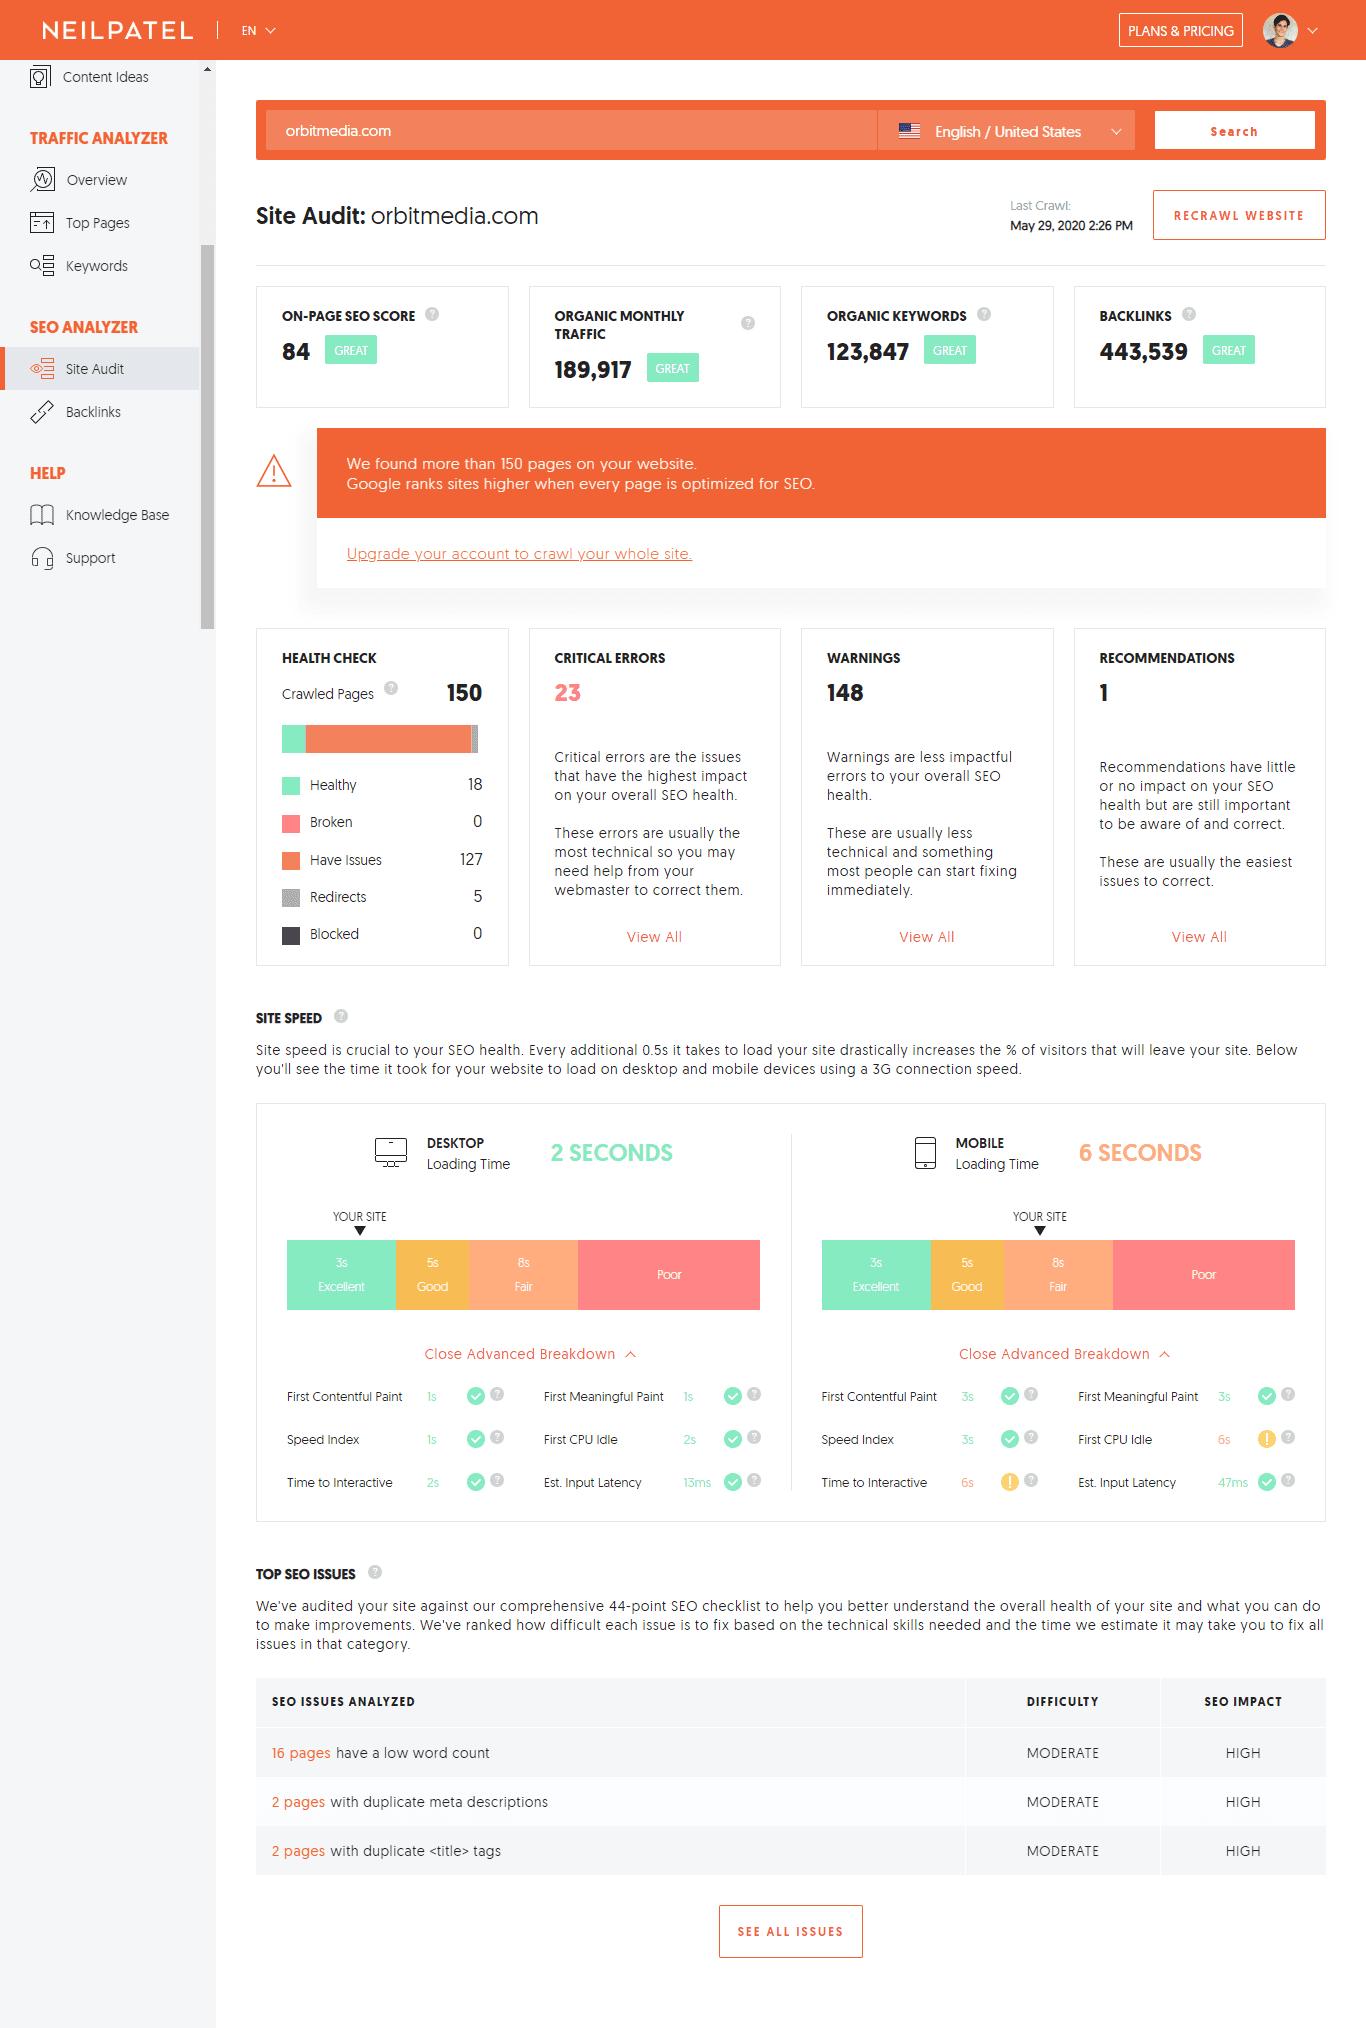 screencapture-app-neilpatel-en-seo-analyzer-site-audit